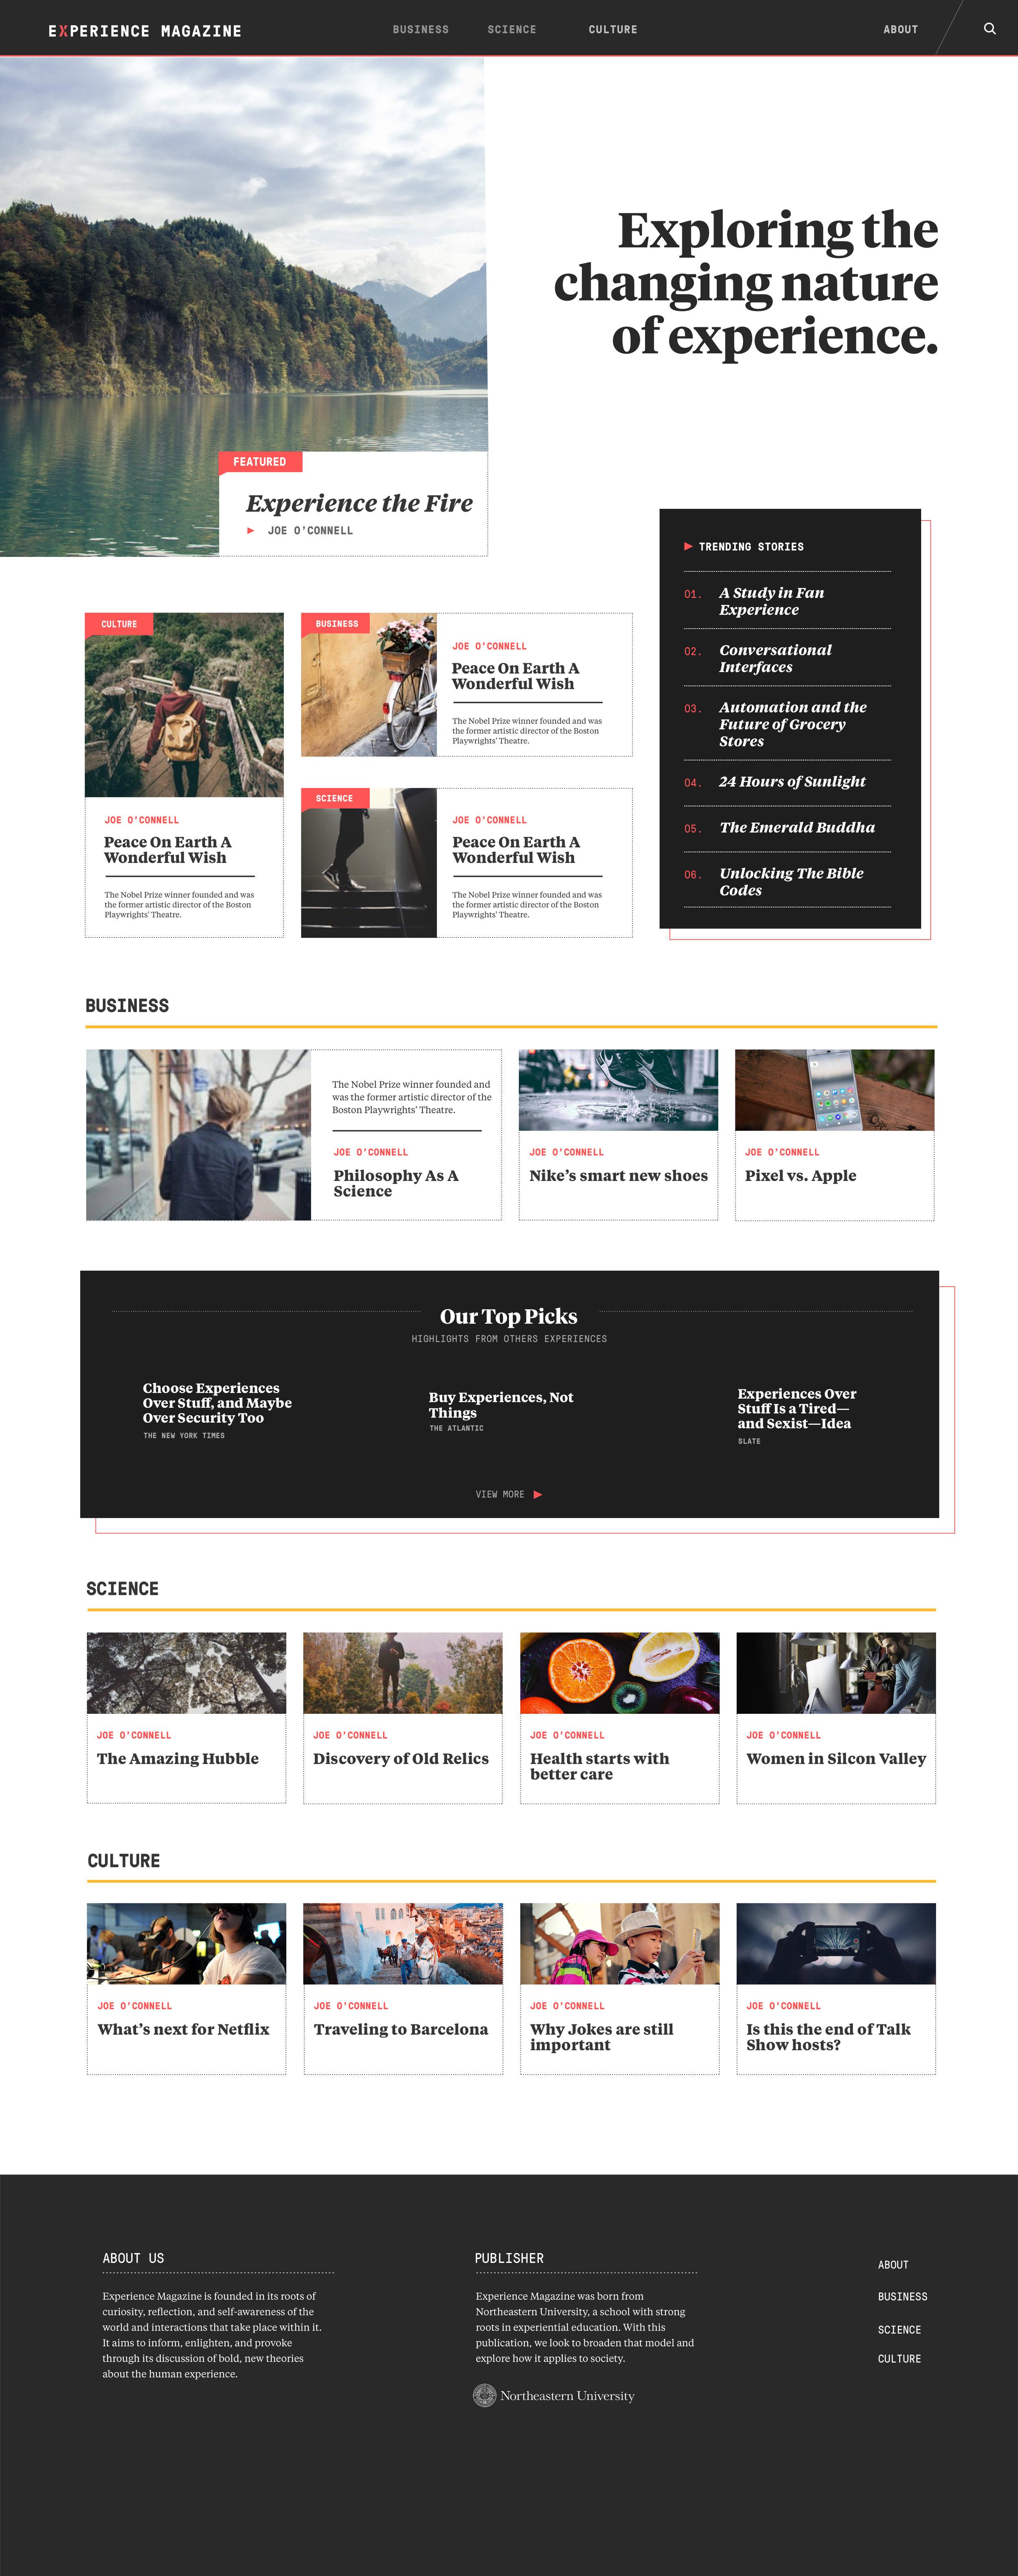 homepage-current copy 2.jpg